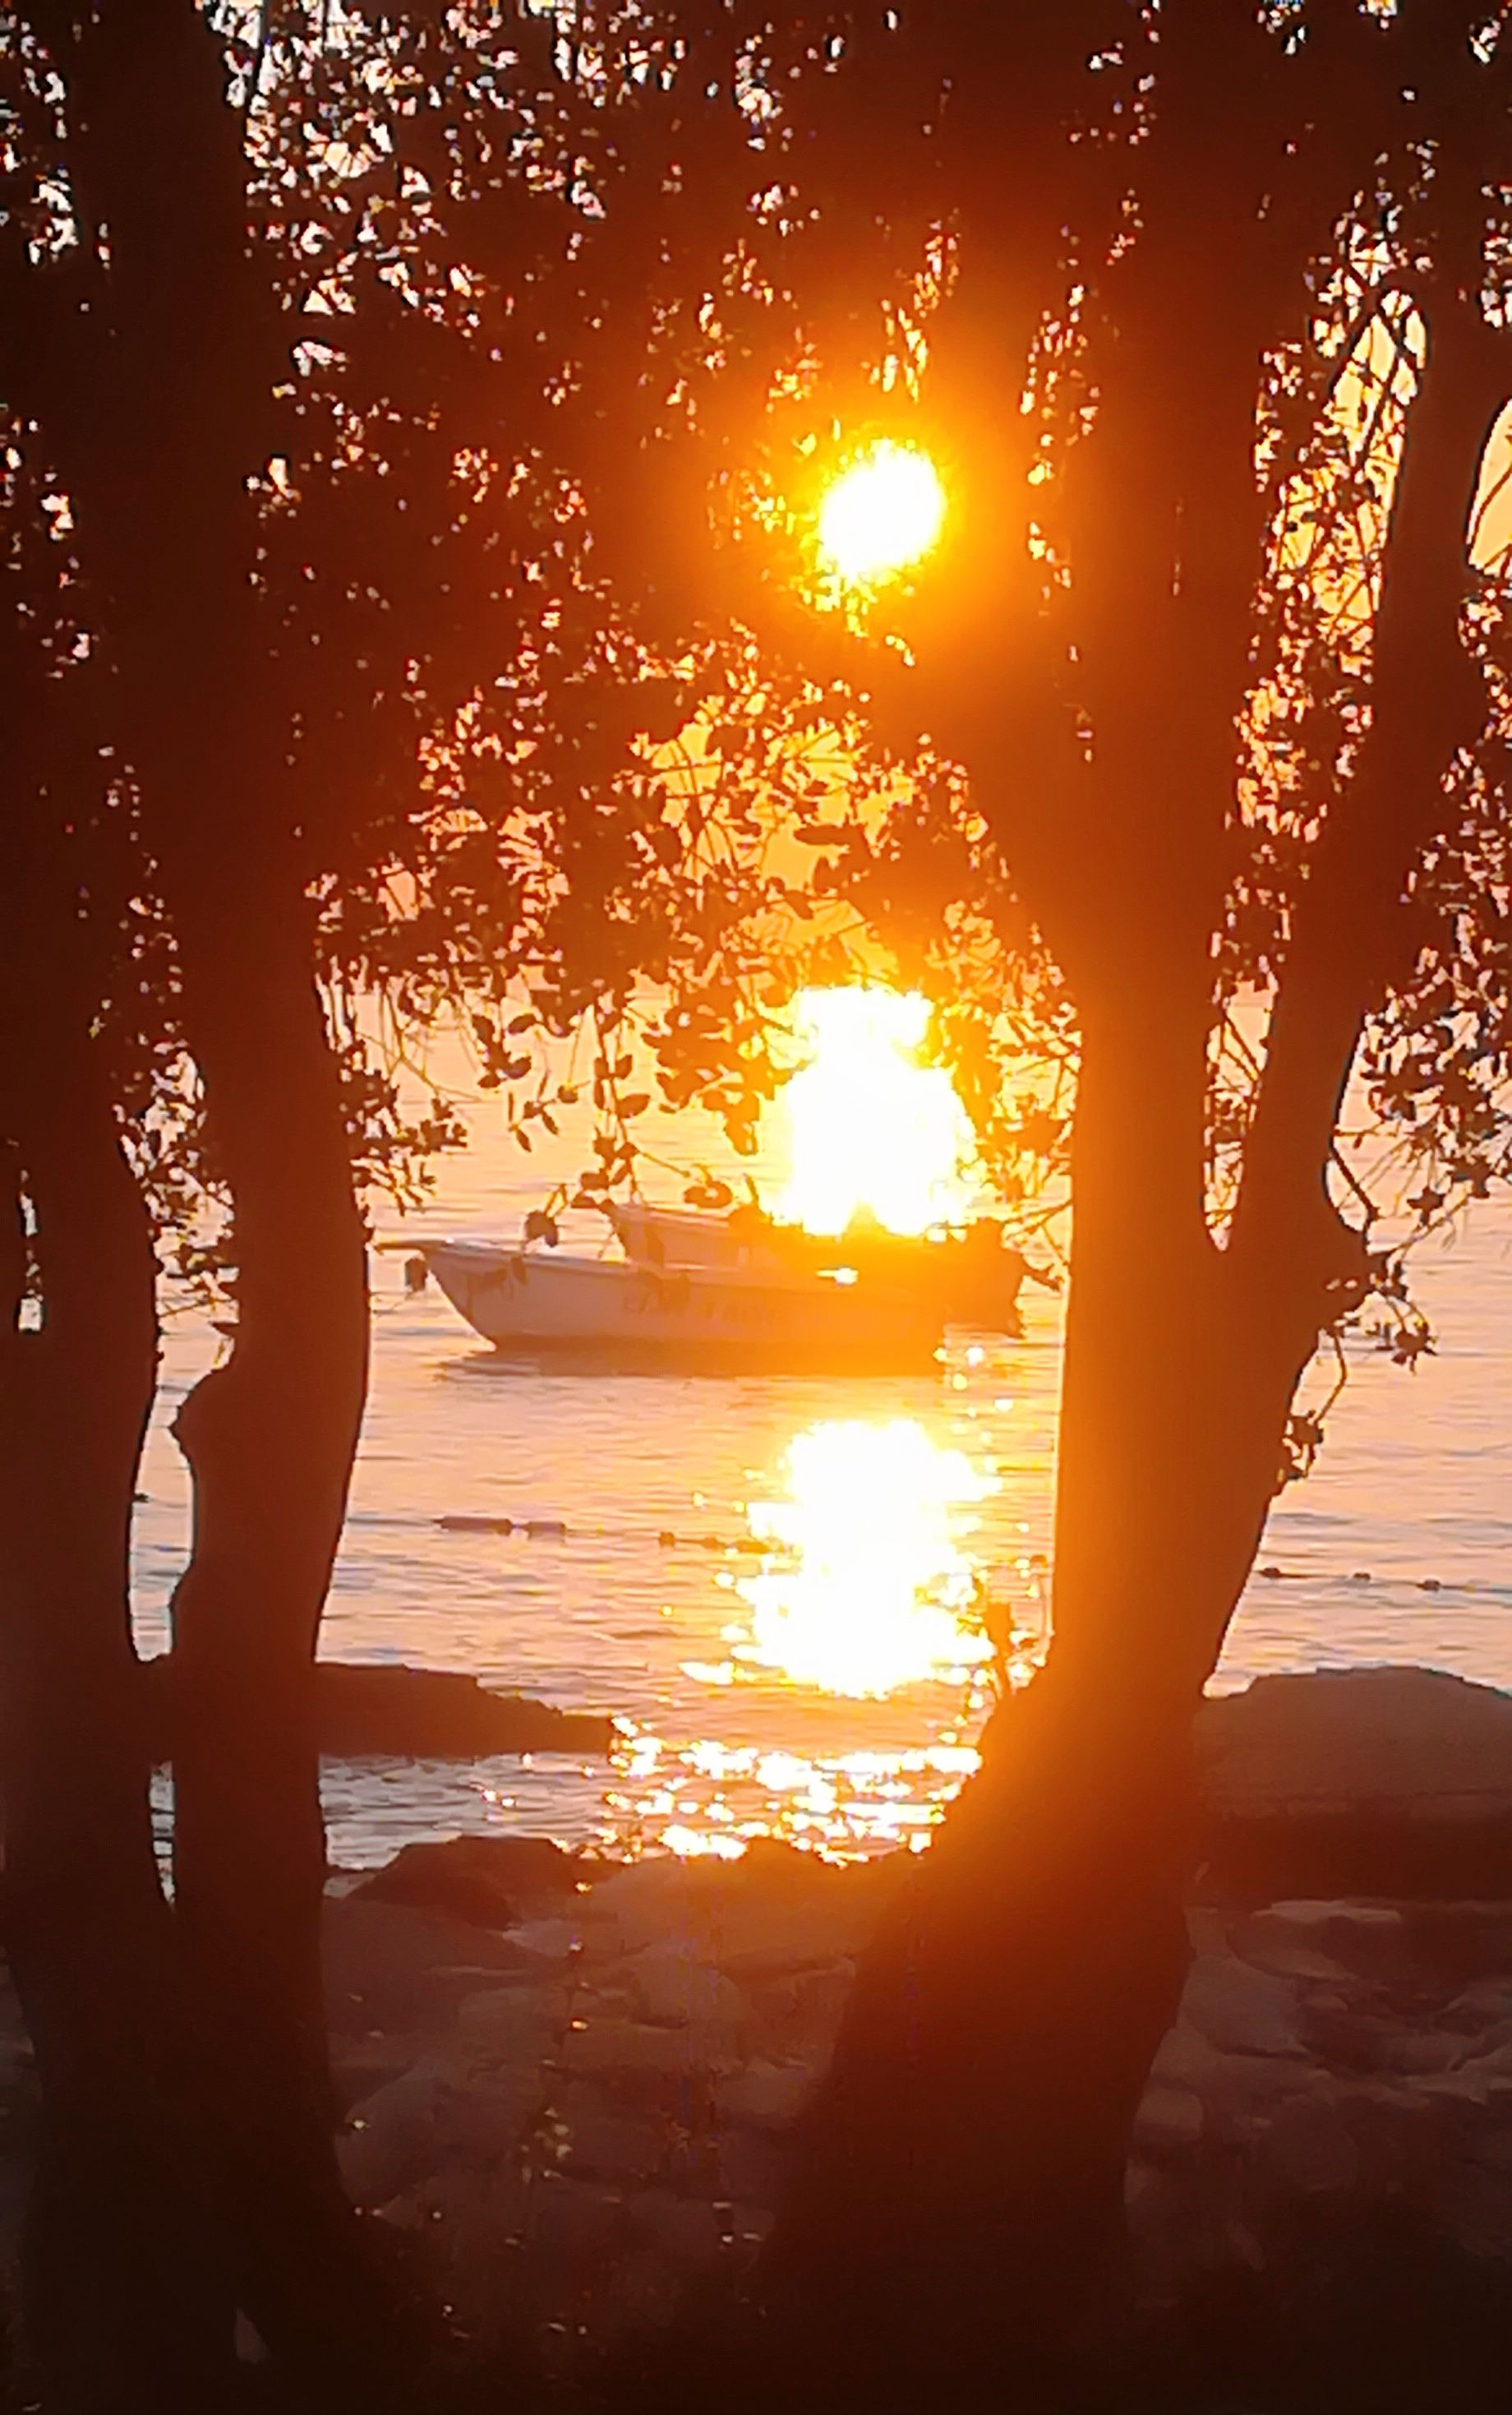 Sunset Porec Kap Istra Istria Istrien Istra Istrie Croatia Kroatien Kroatie Chorwacja Chorvatsko Croazie Porec Kroatie Croatia Photo Sunset